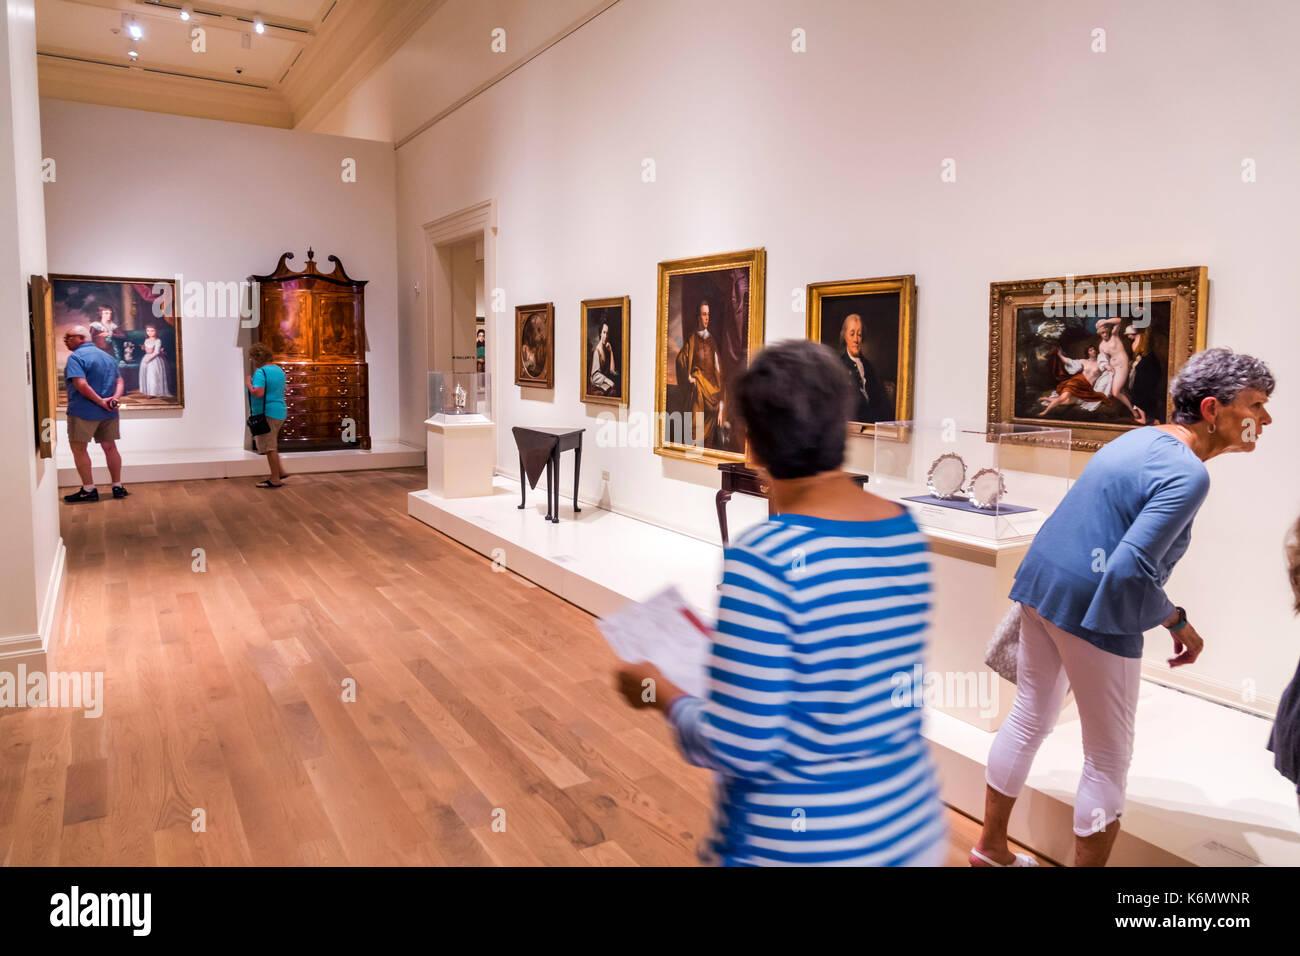 Charleston South Carolina SC Historic Downtown Gibbes Museum of Art exhibit interior gallery - Stock Image